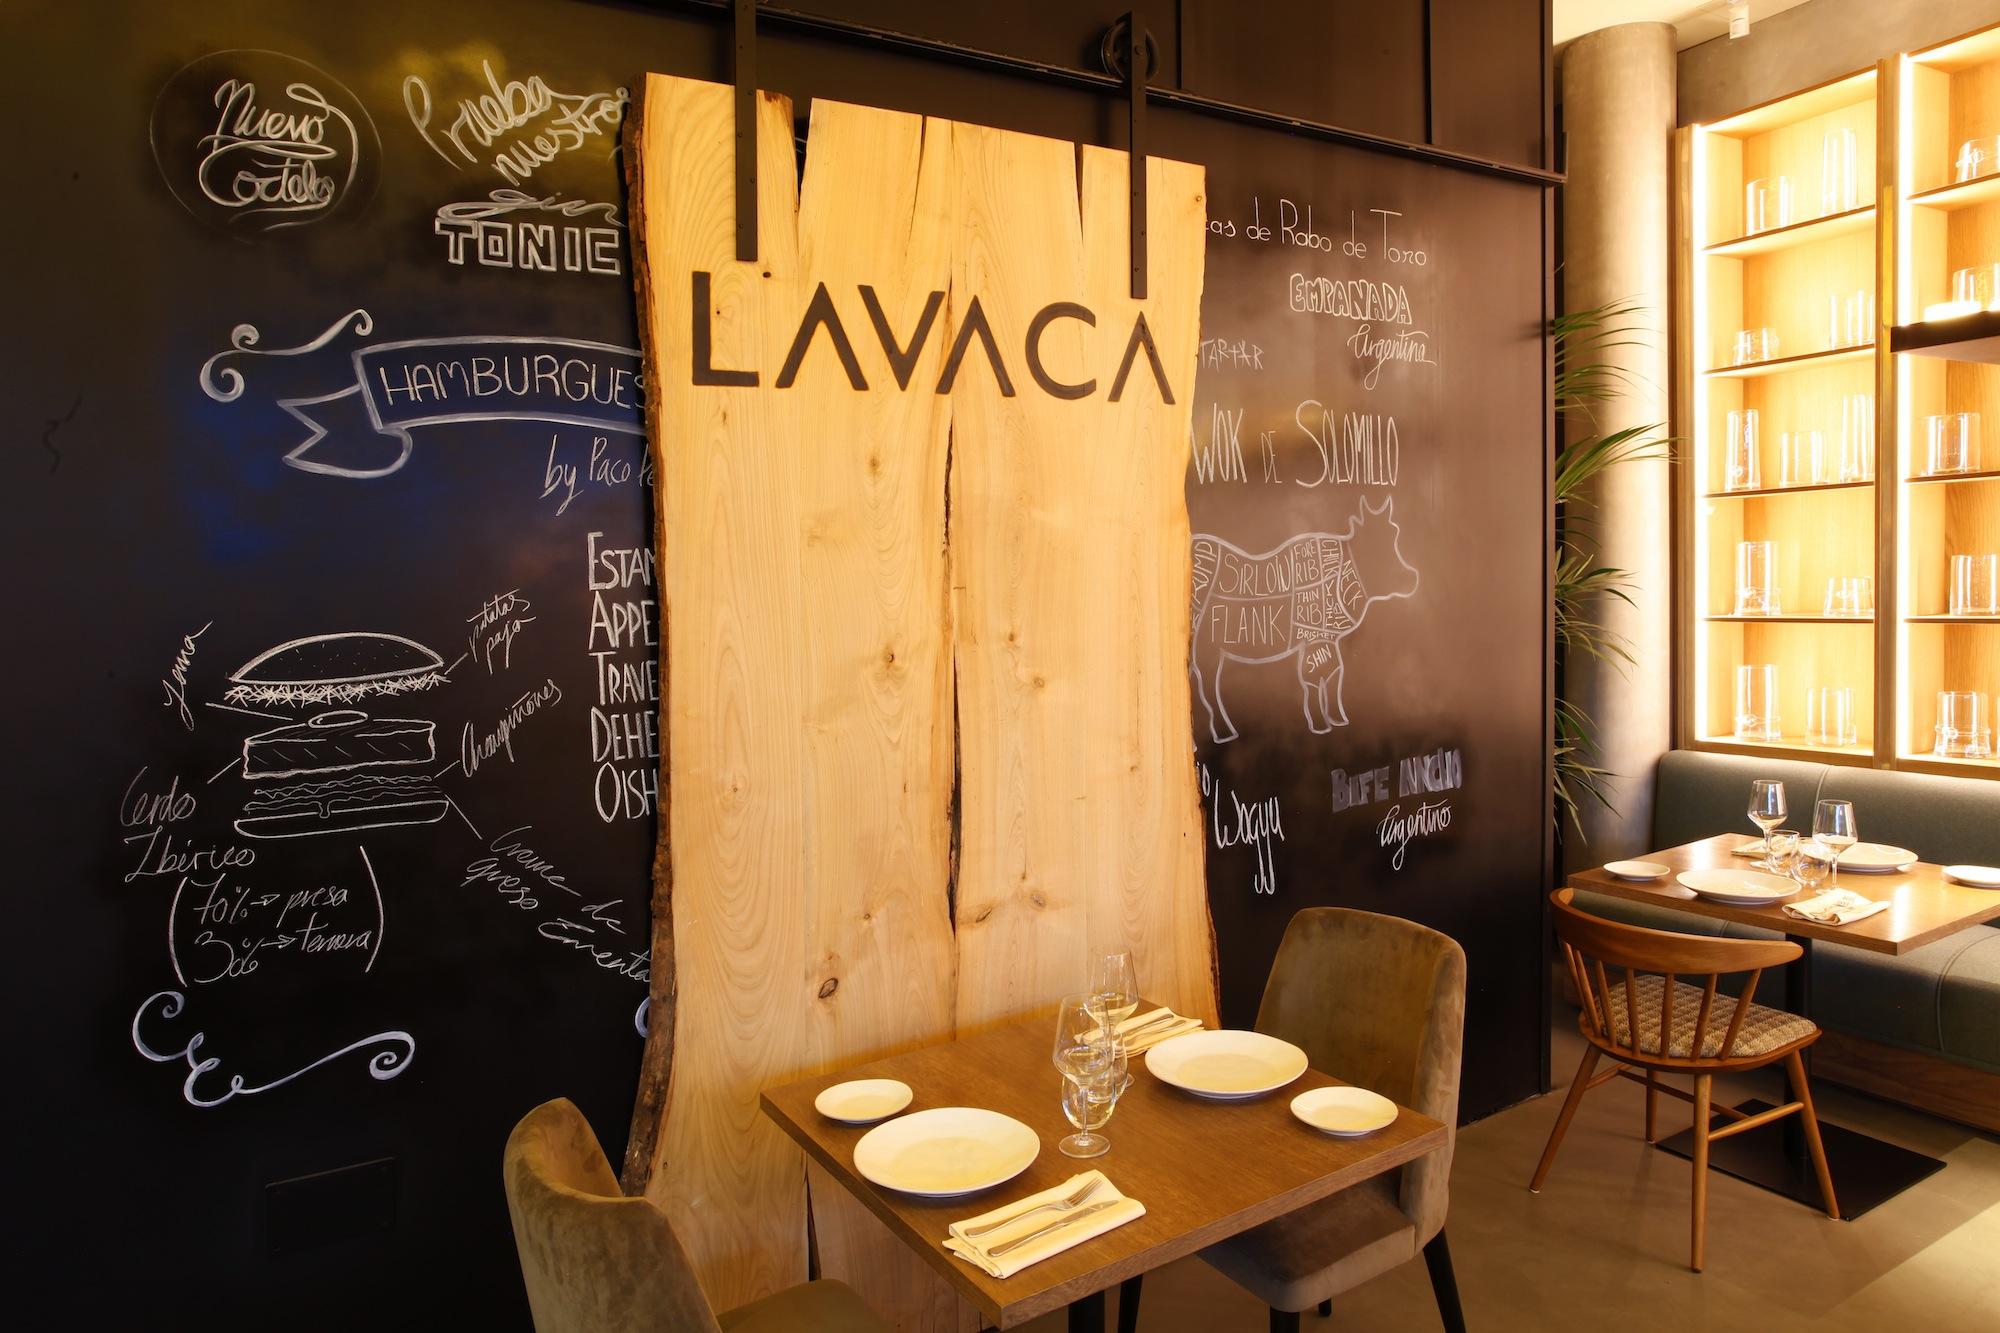 Cousi interiorismo reforma lavaca creando un restaurante - Cousi interiorismo ...